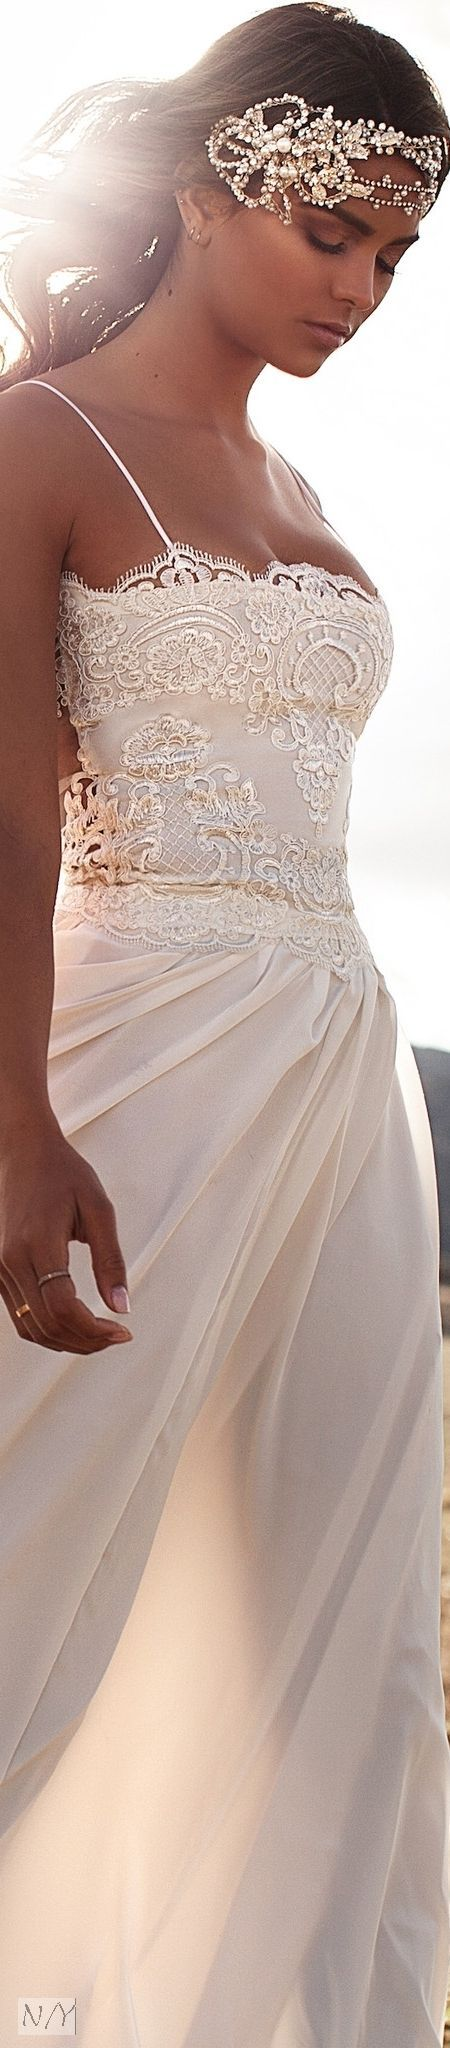 1-wedding-dresses   fashion style   Page 24